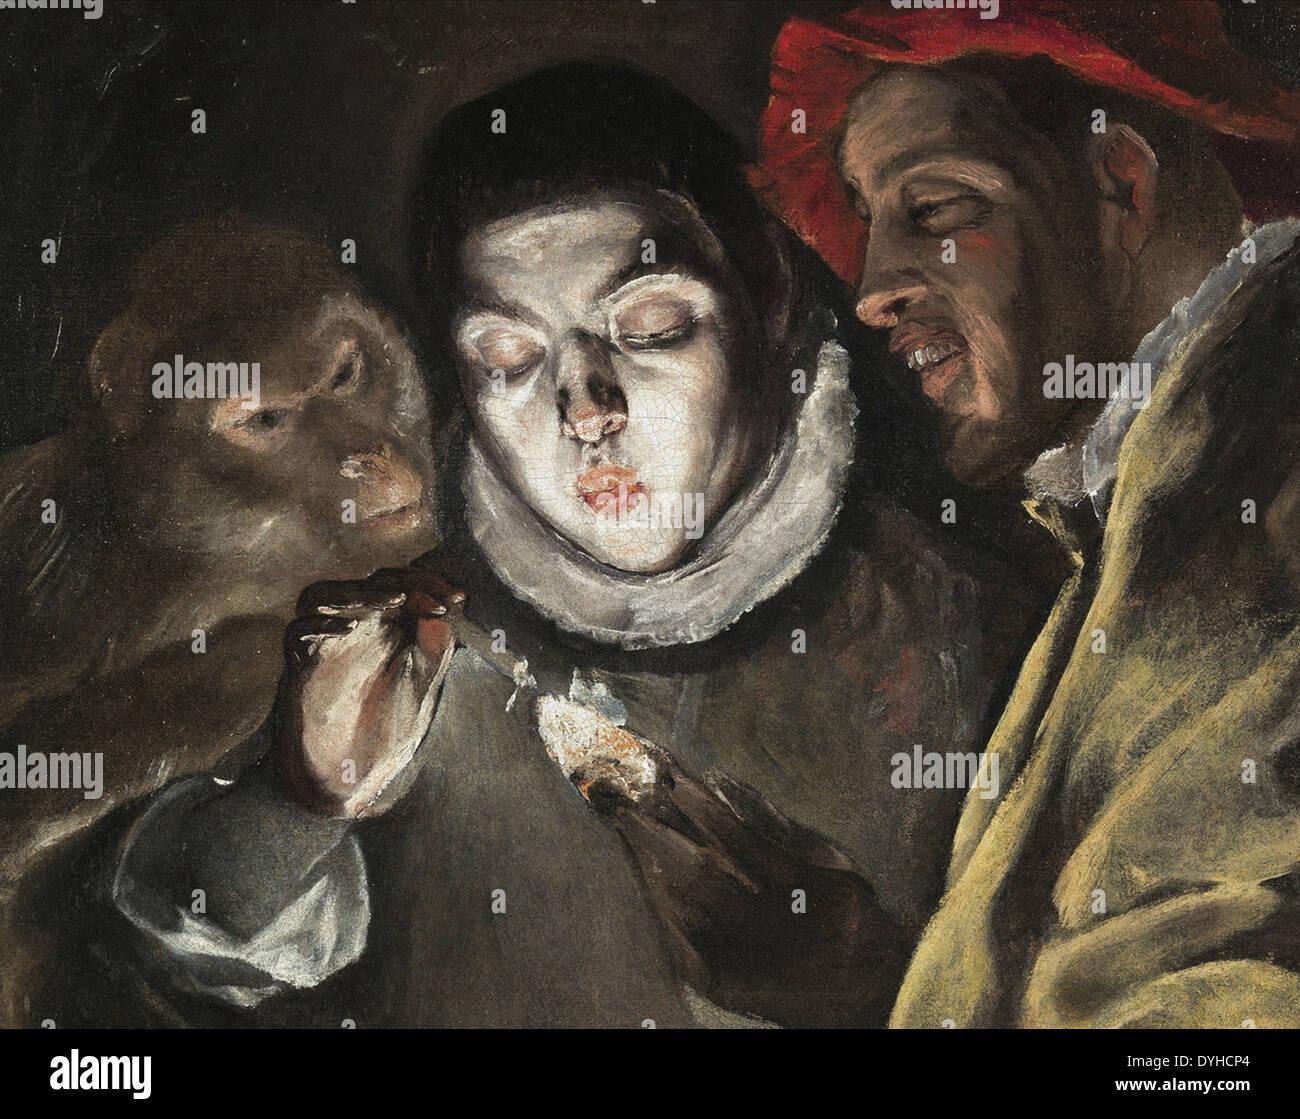 El Greco Fable - Stock Image